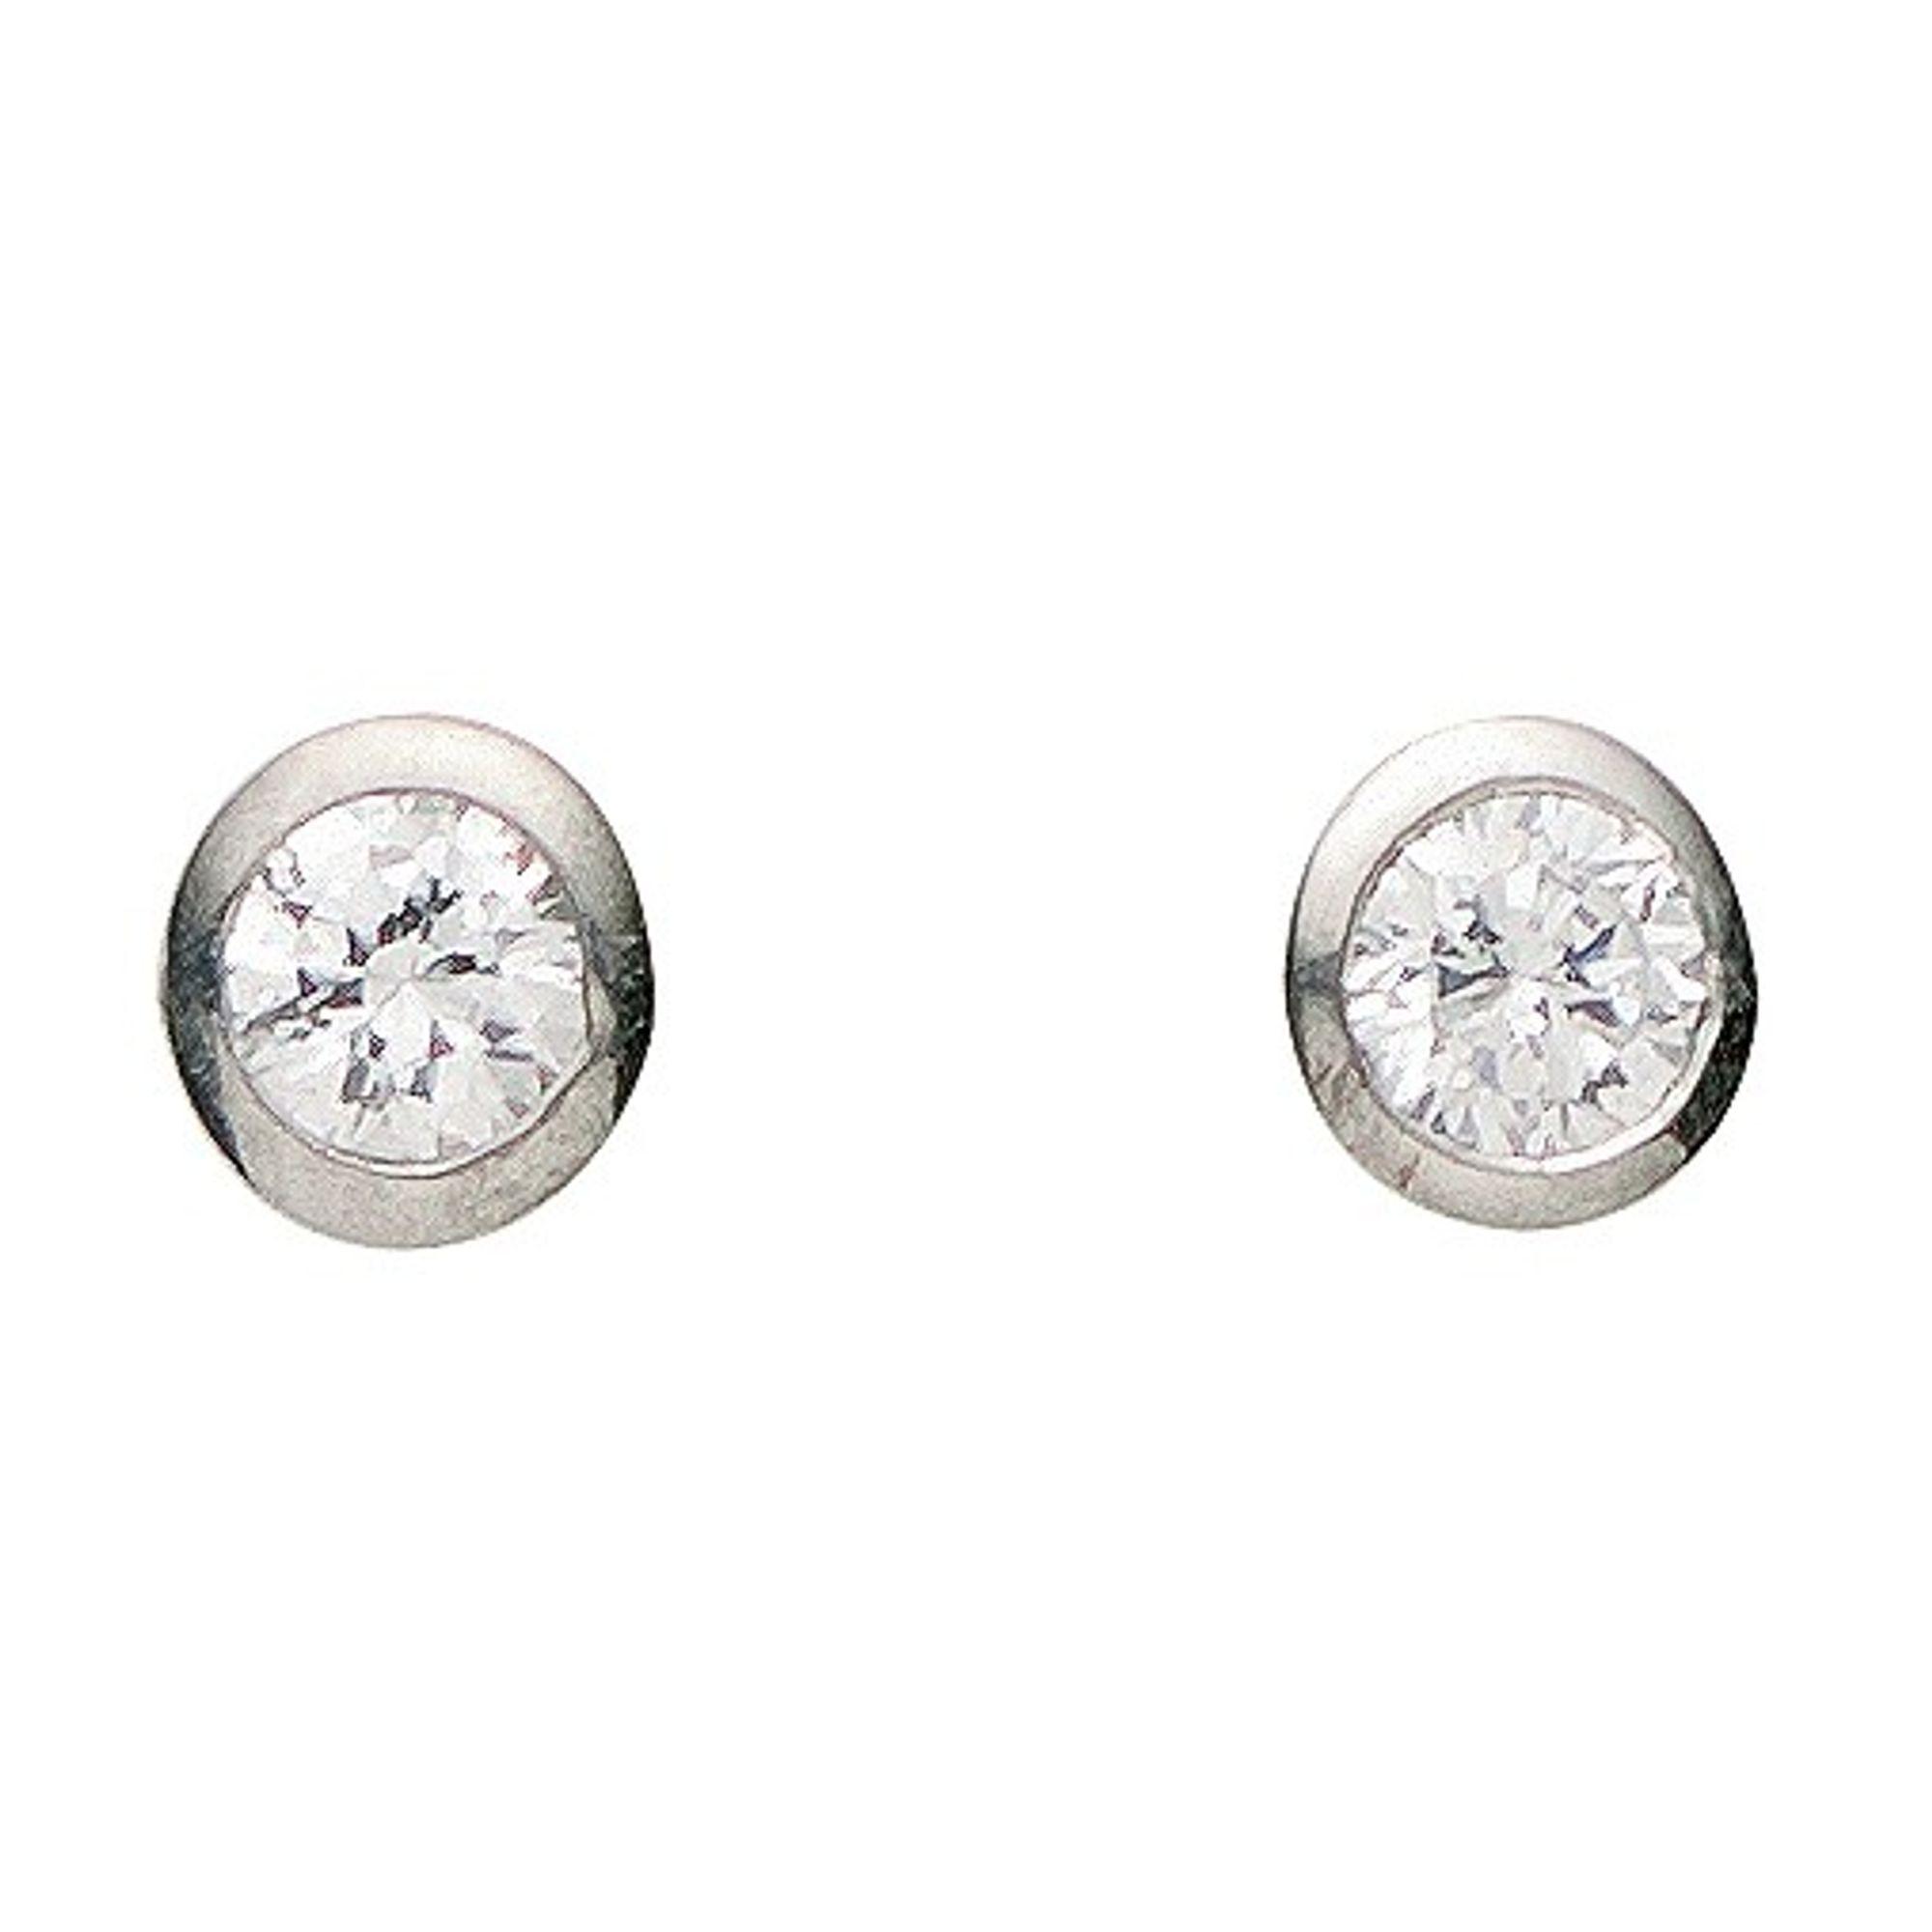 Basic Silber 01.1097W Damen Ohrstecker Silber Zirkonia weiß